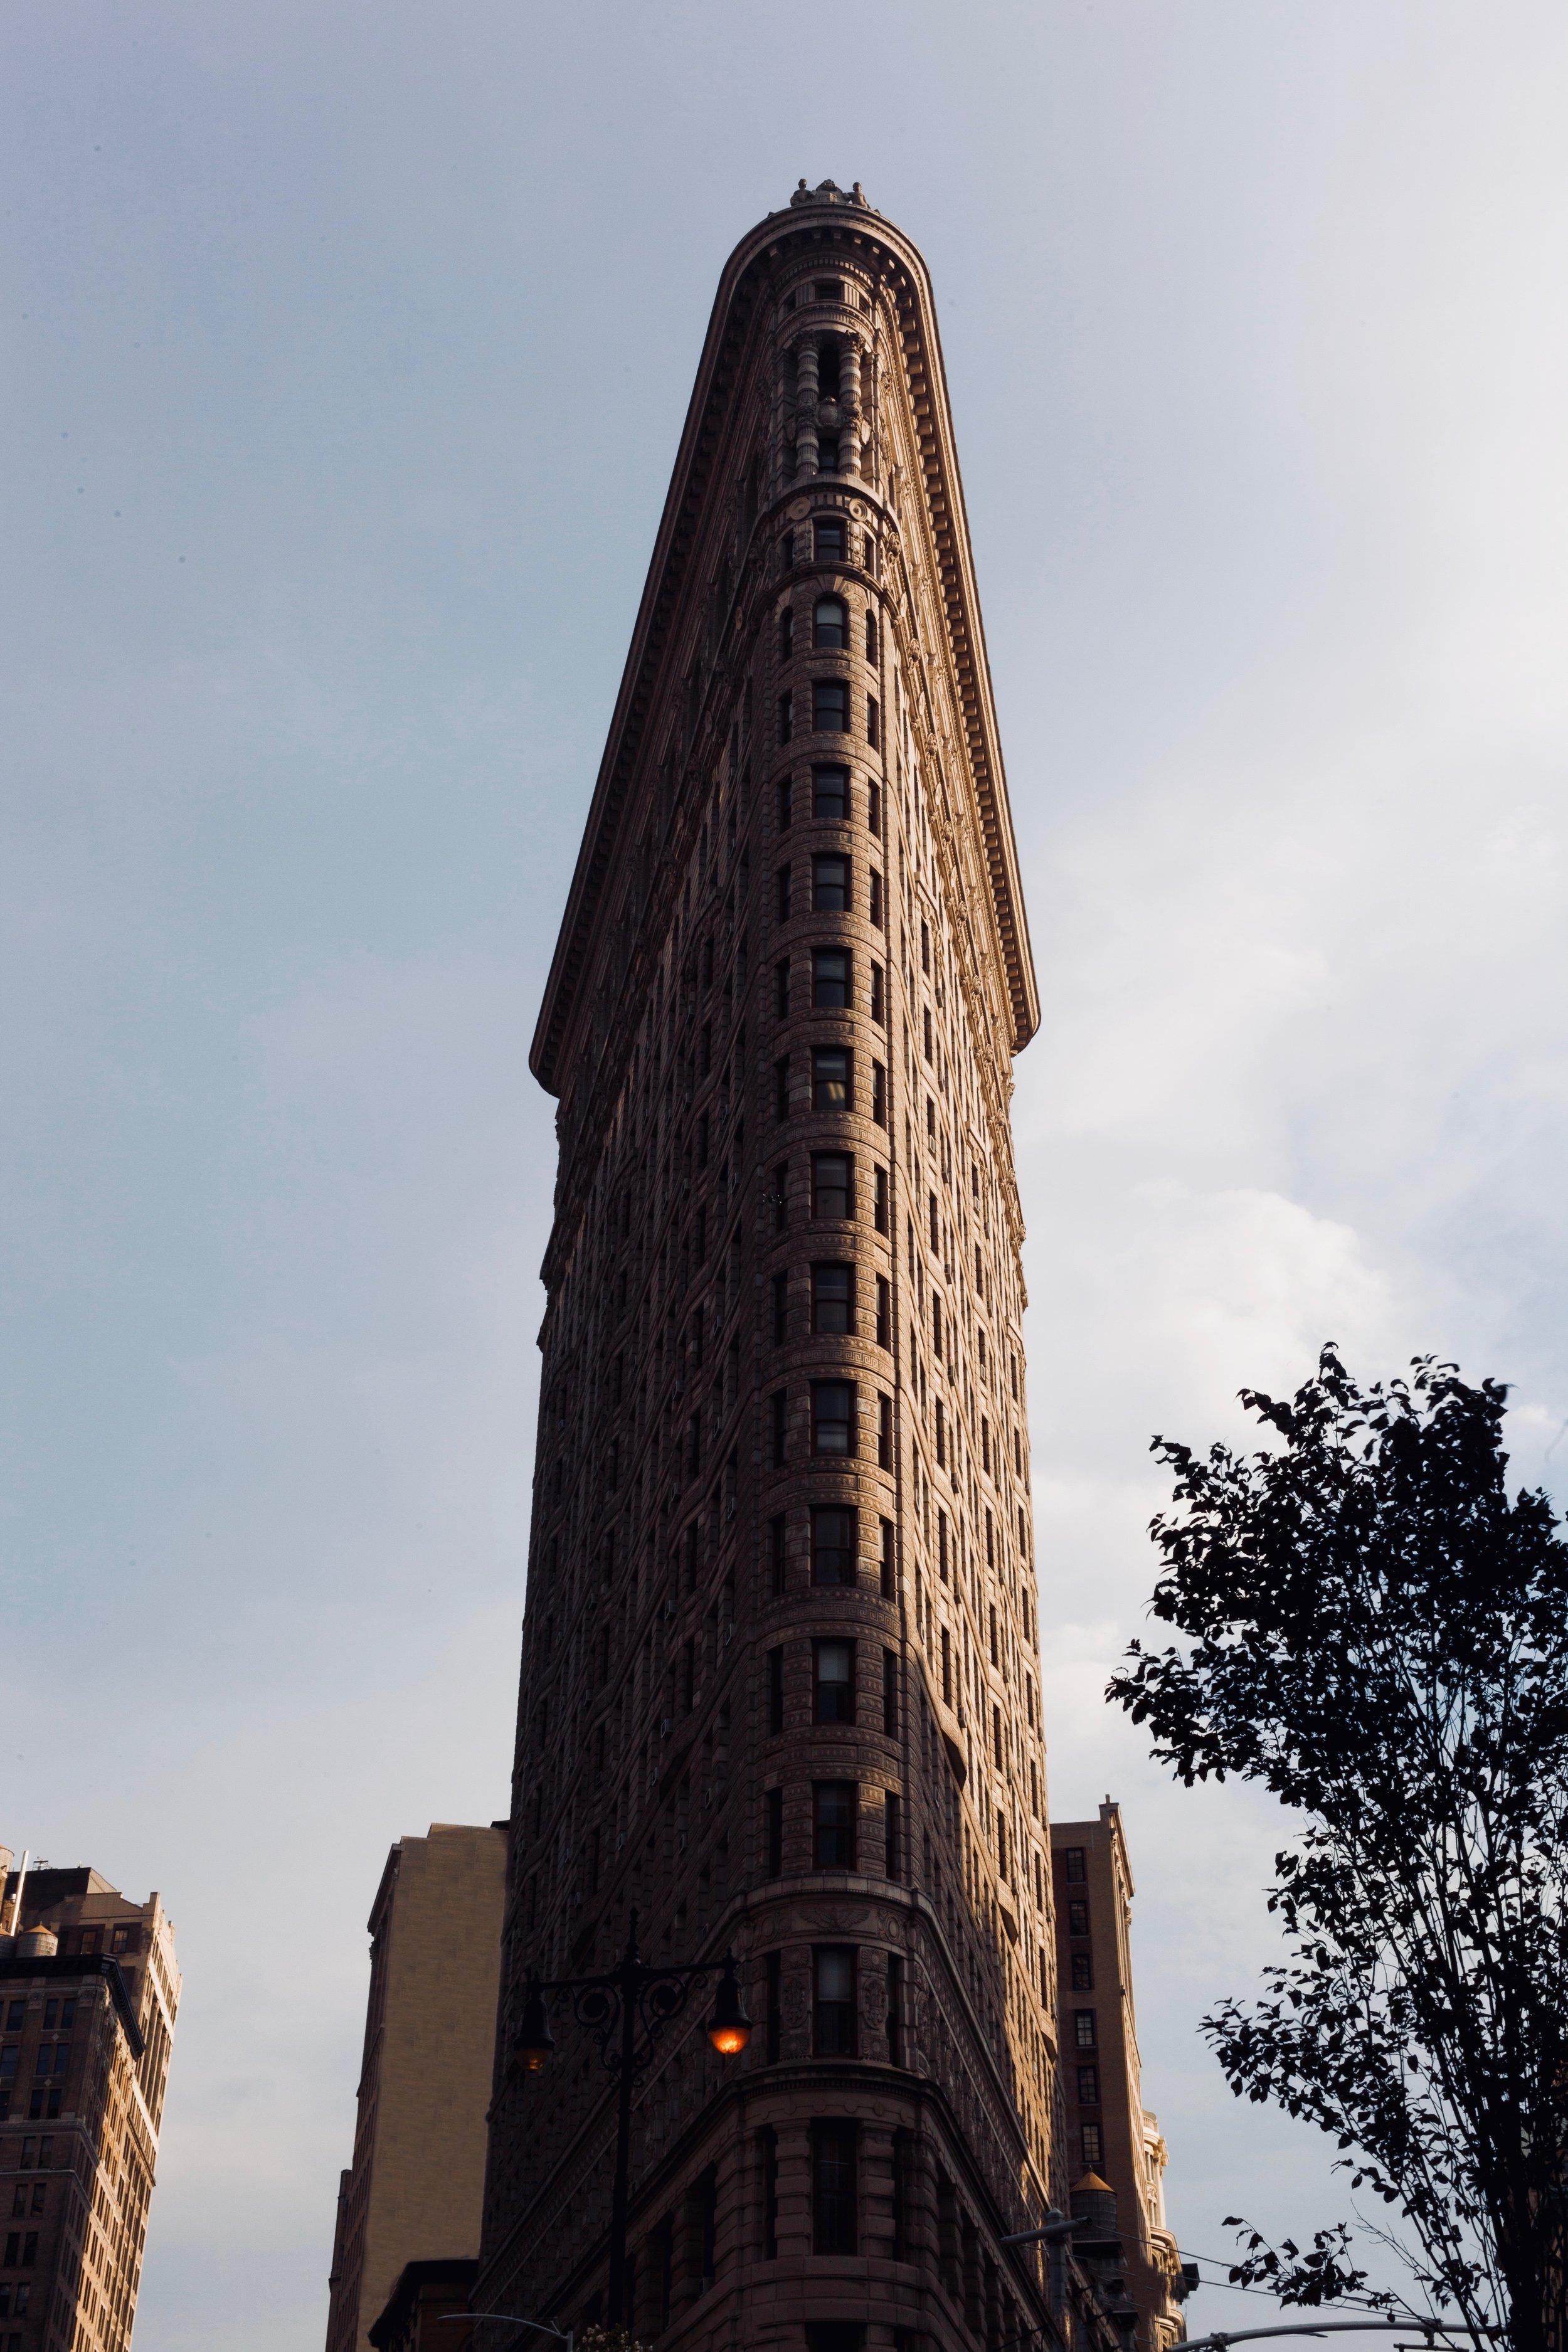 NYC-PY16.JPG